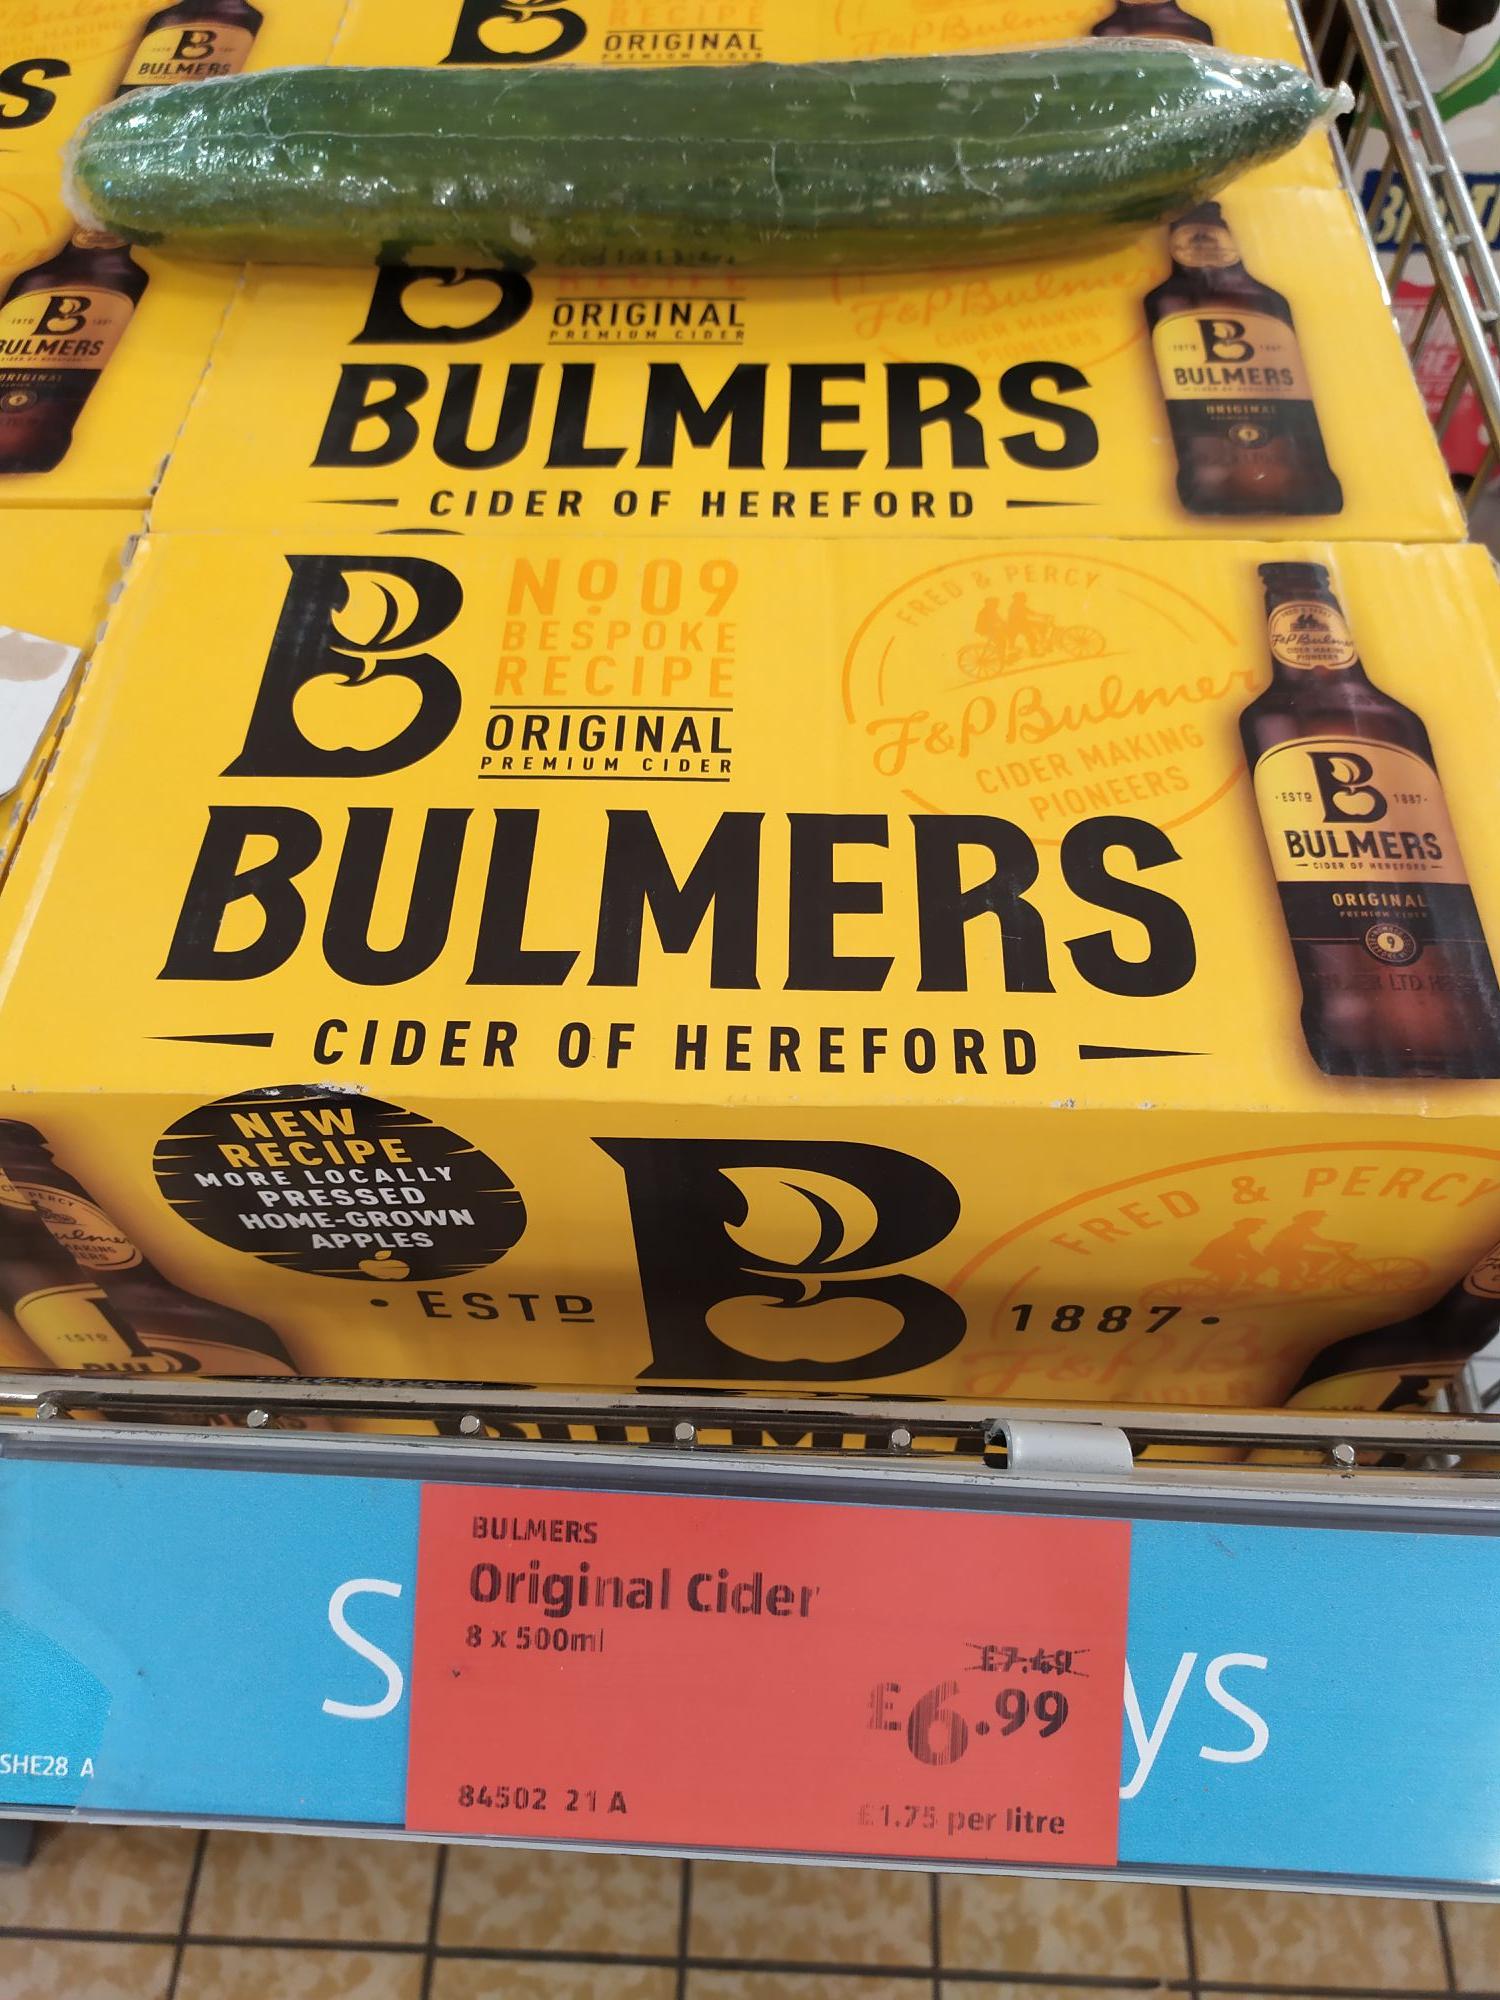 Apple Bulmers £6.99 in Aldi Southampton